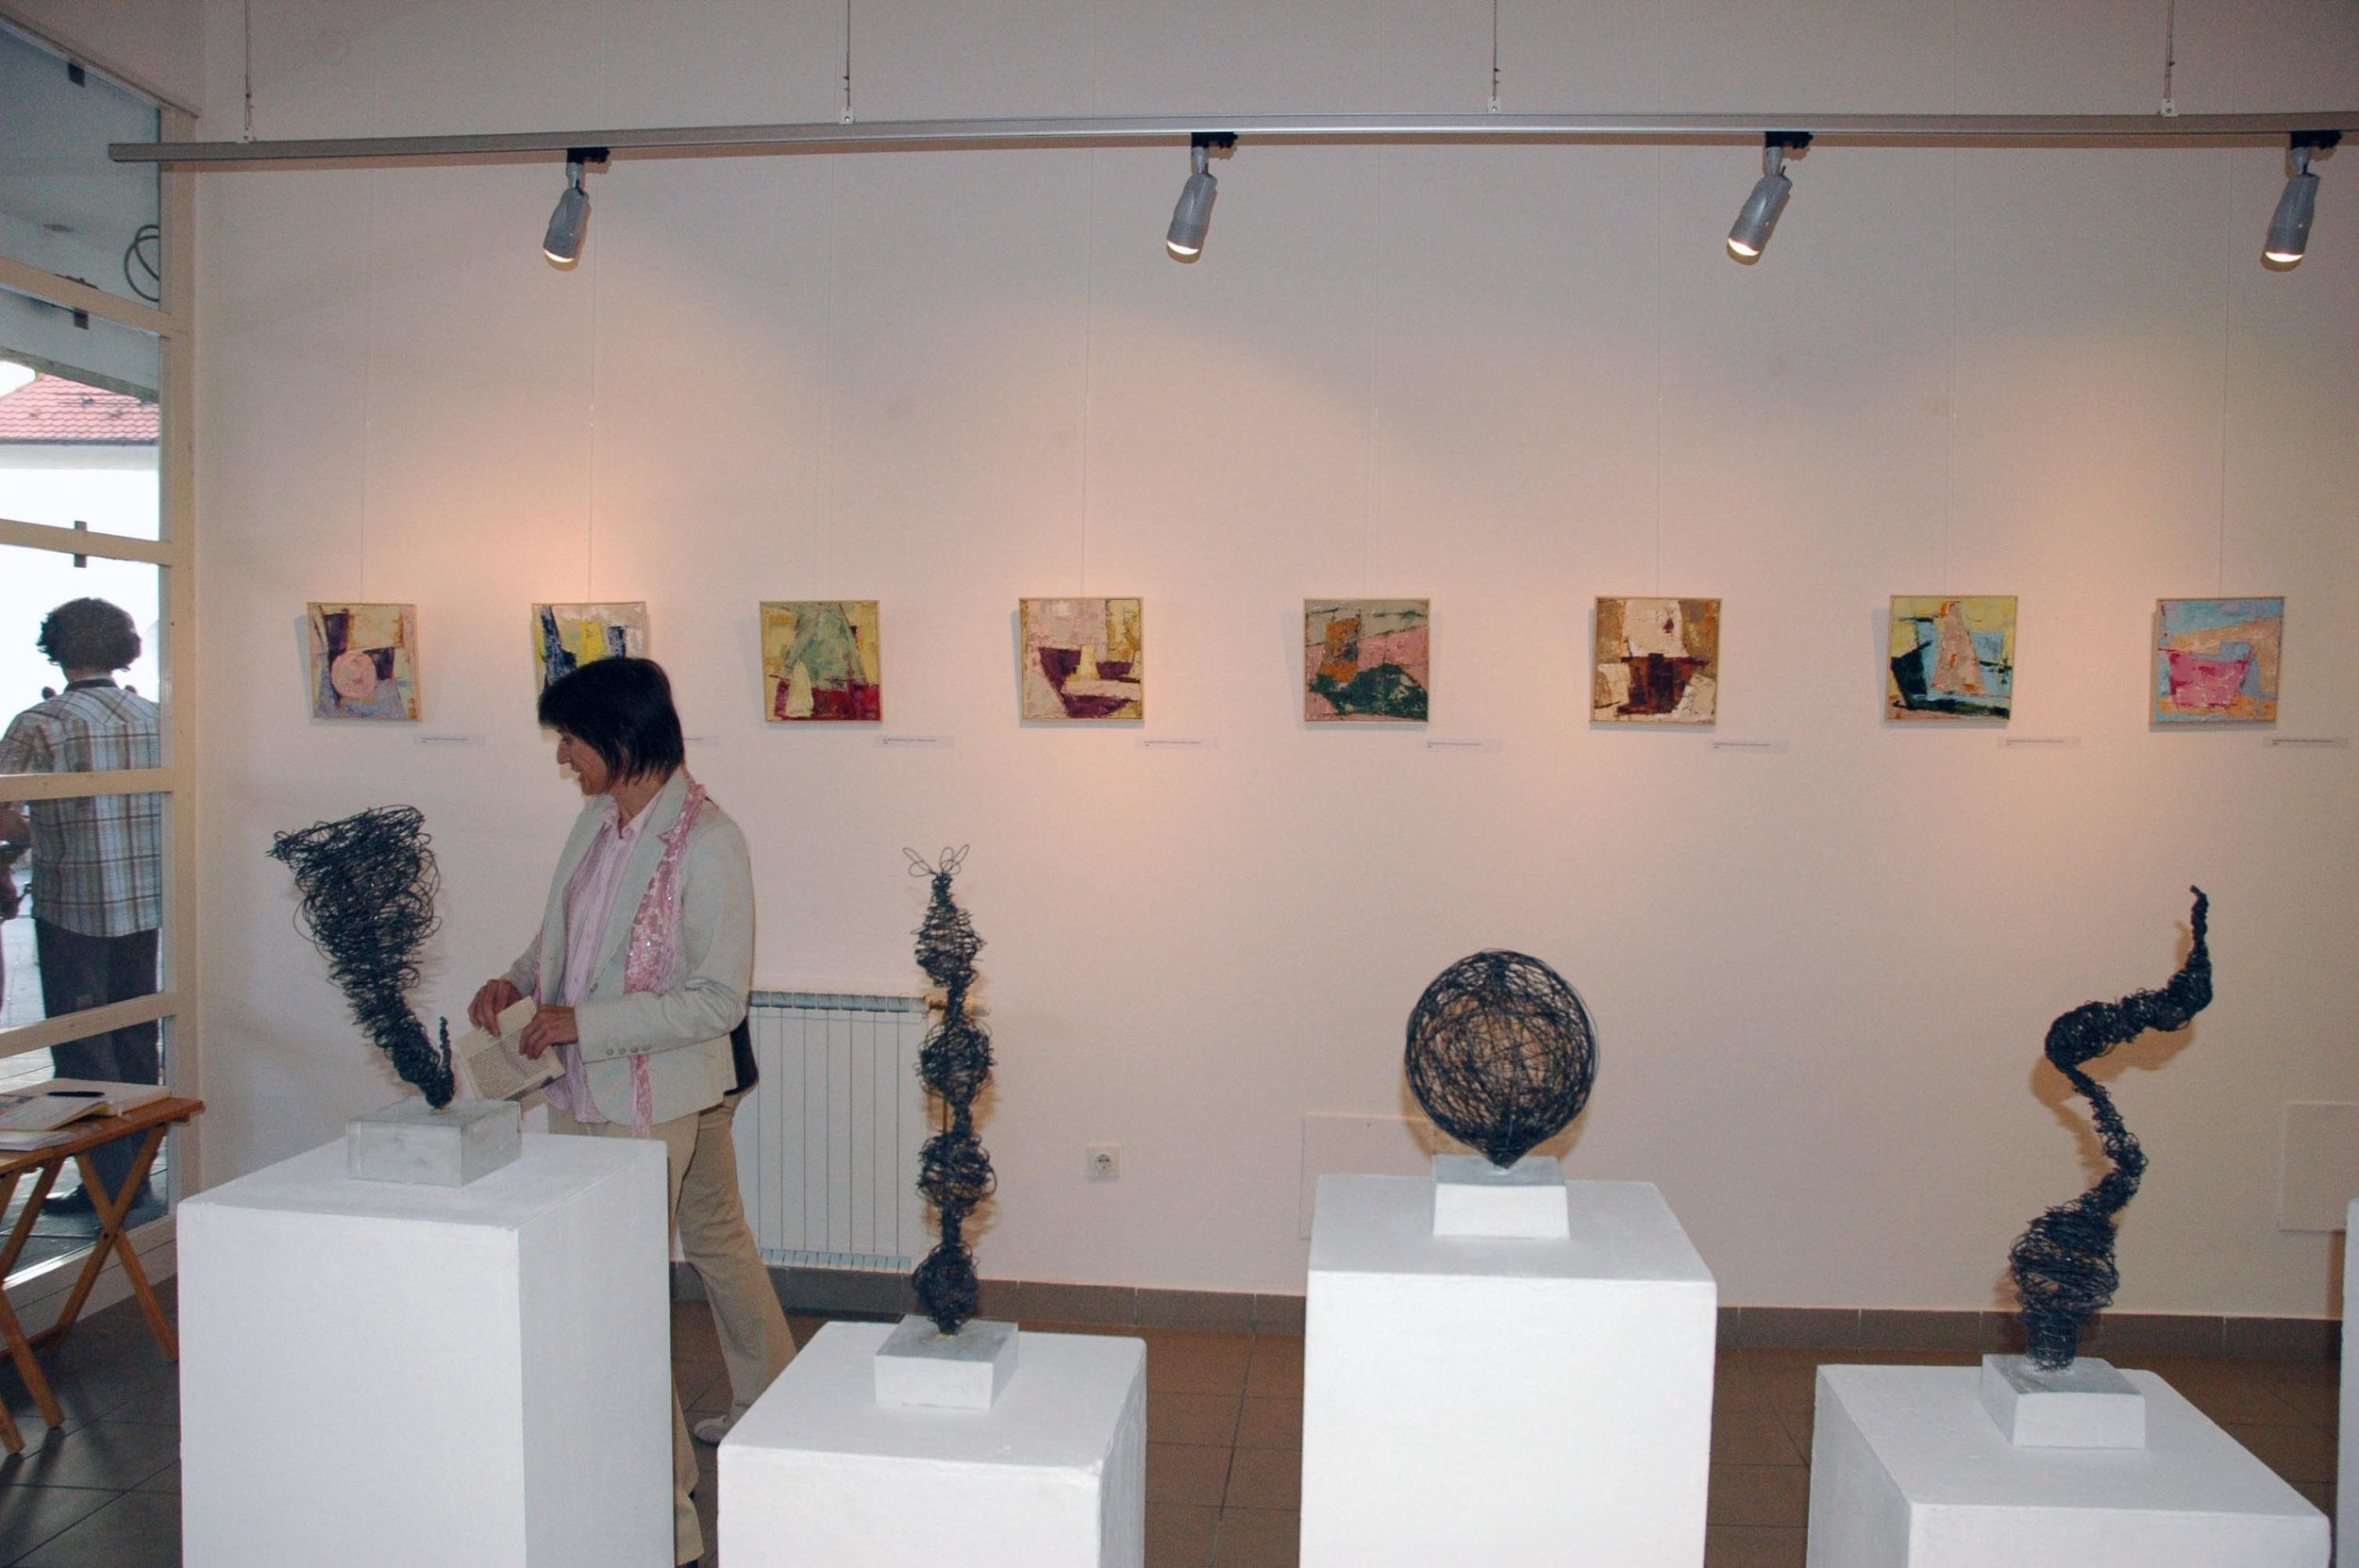 Samostojna razstava Natalije Kozjek, Media Nox (fotoarhiv dr. Dragica Marinič)